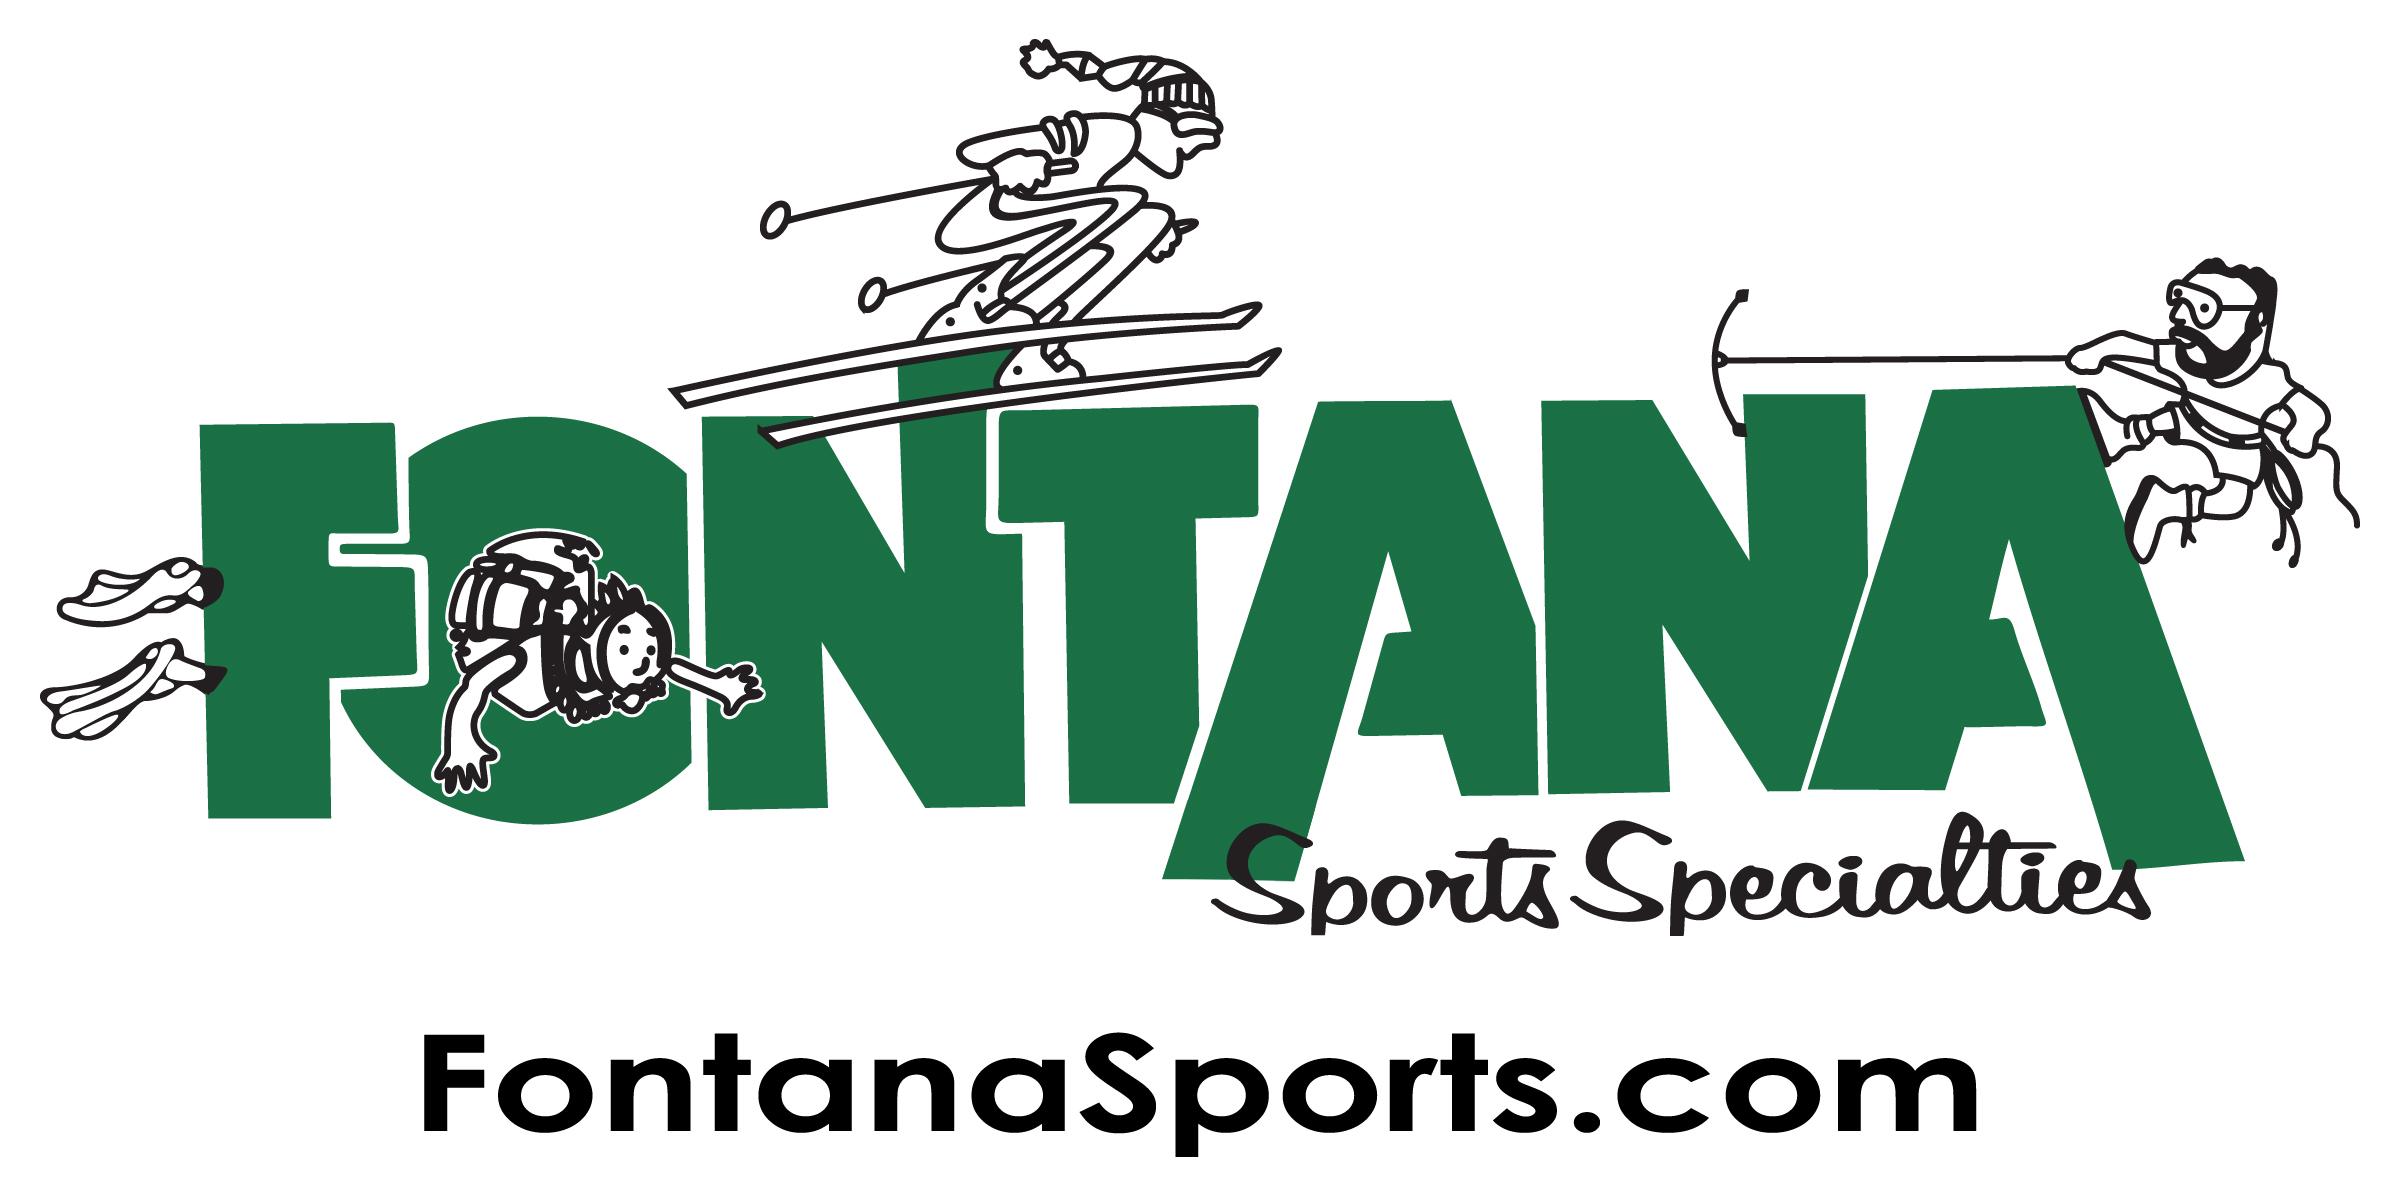 FAV High Res Fontana Logo in Green